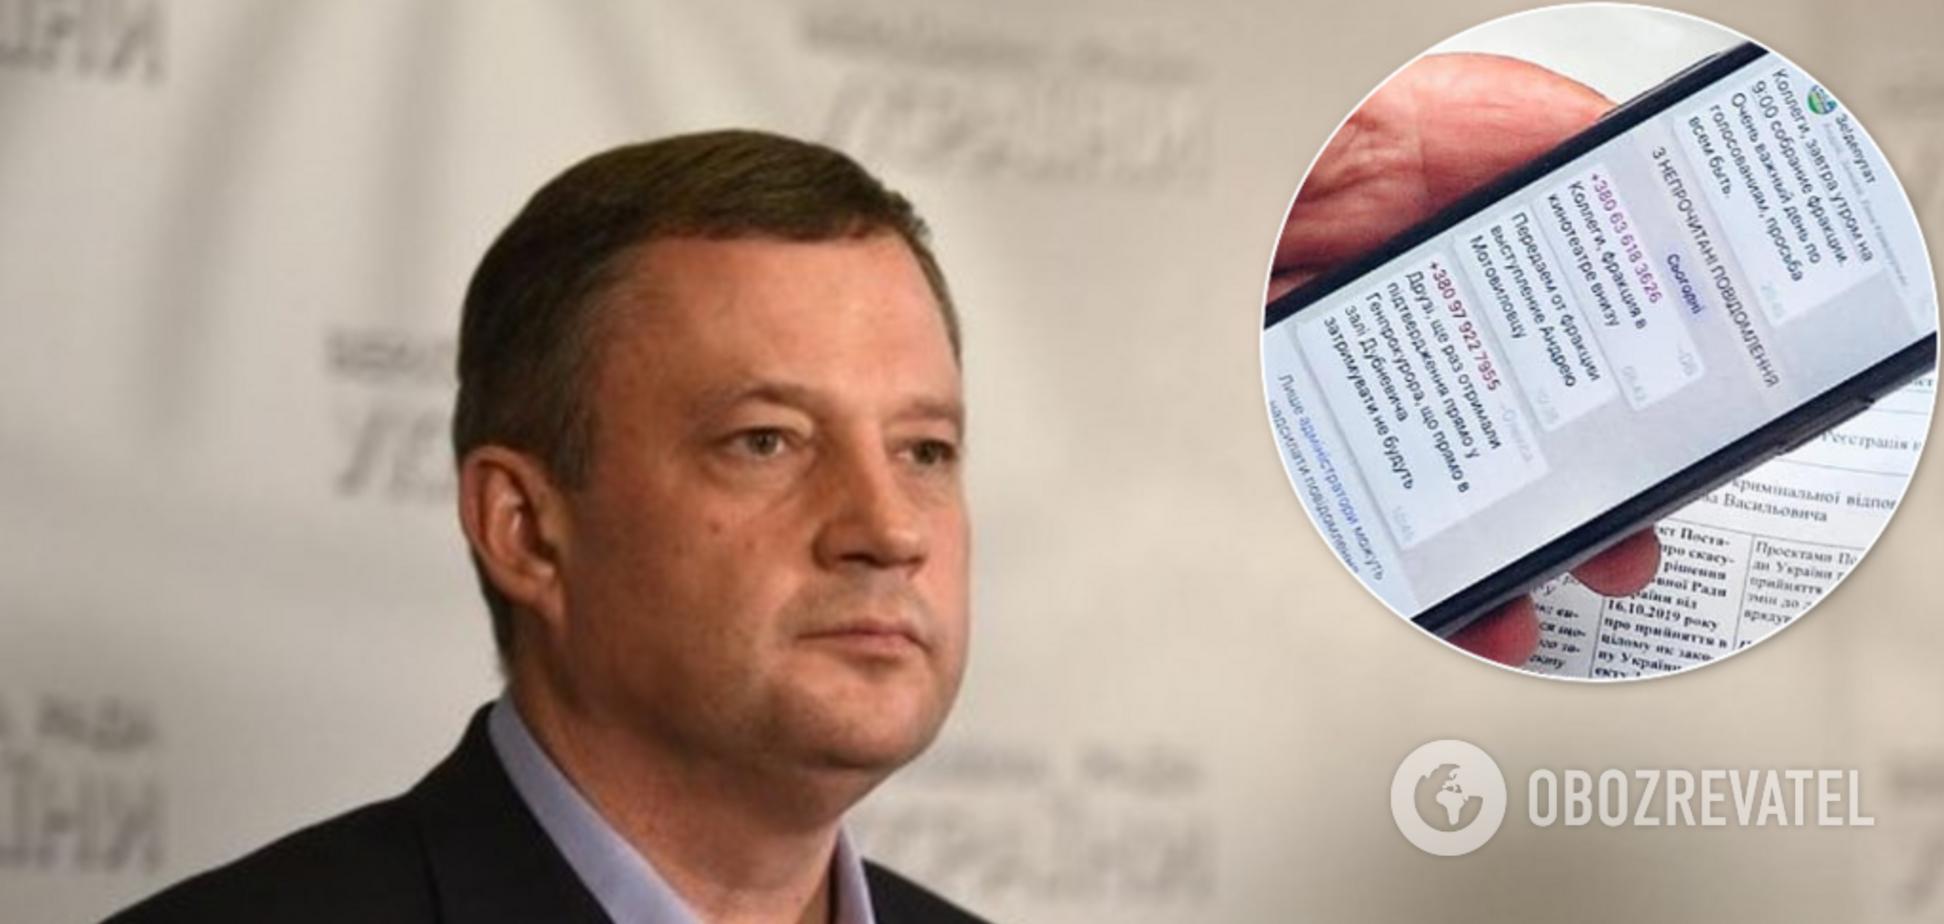 'Прямо у генпрокурора!' Нардеп спалил переписку о 'договорняке' по Дубневичу